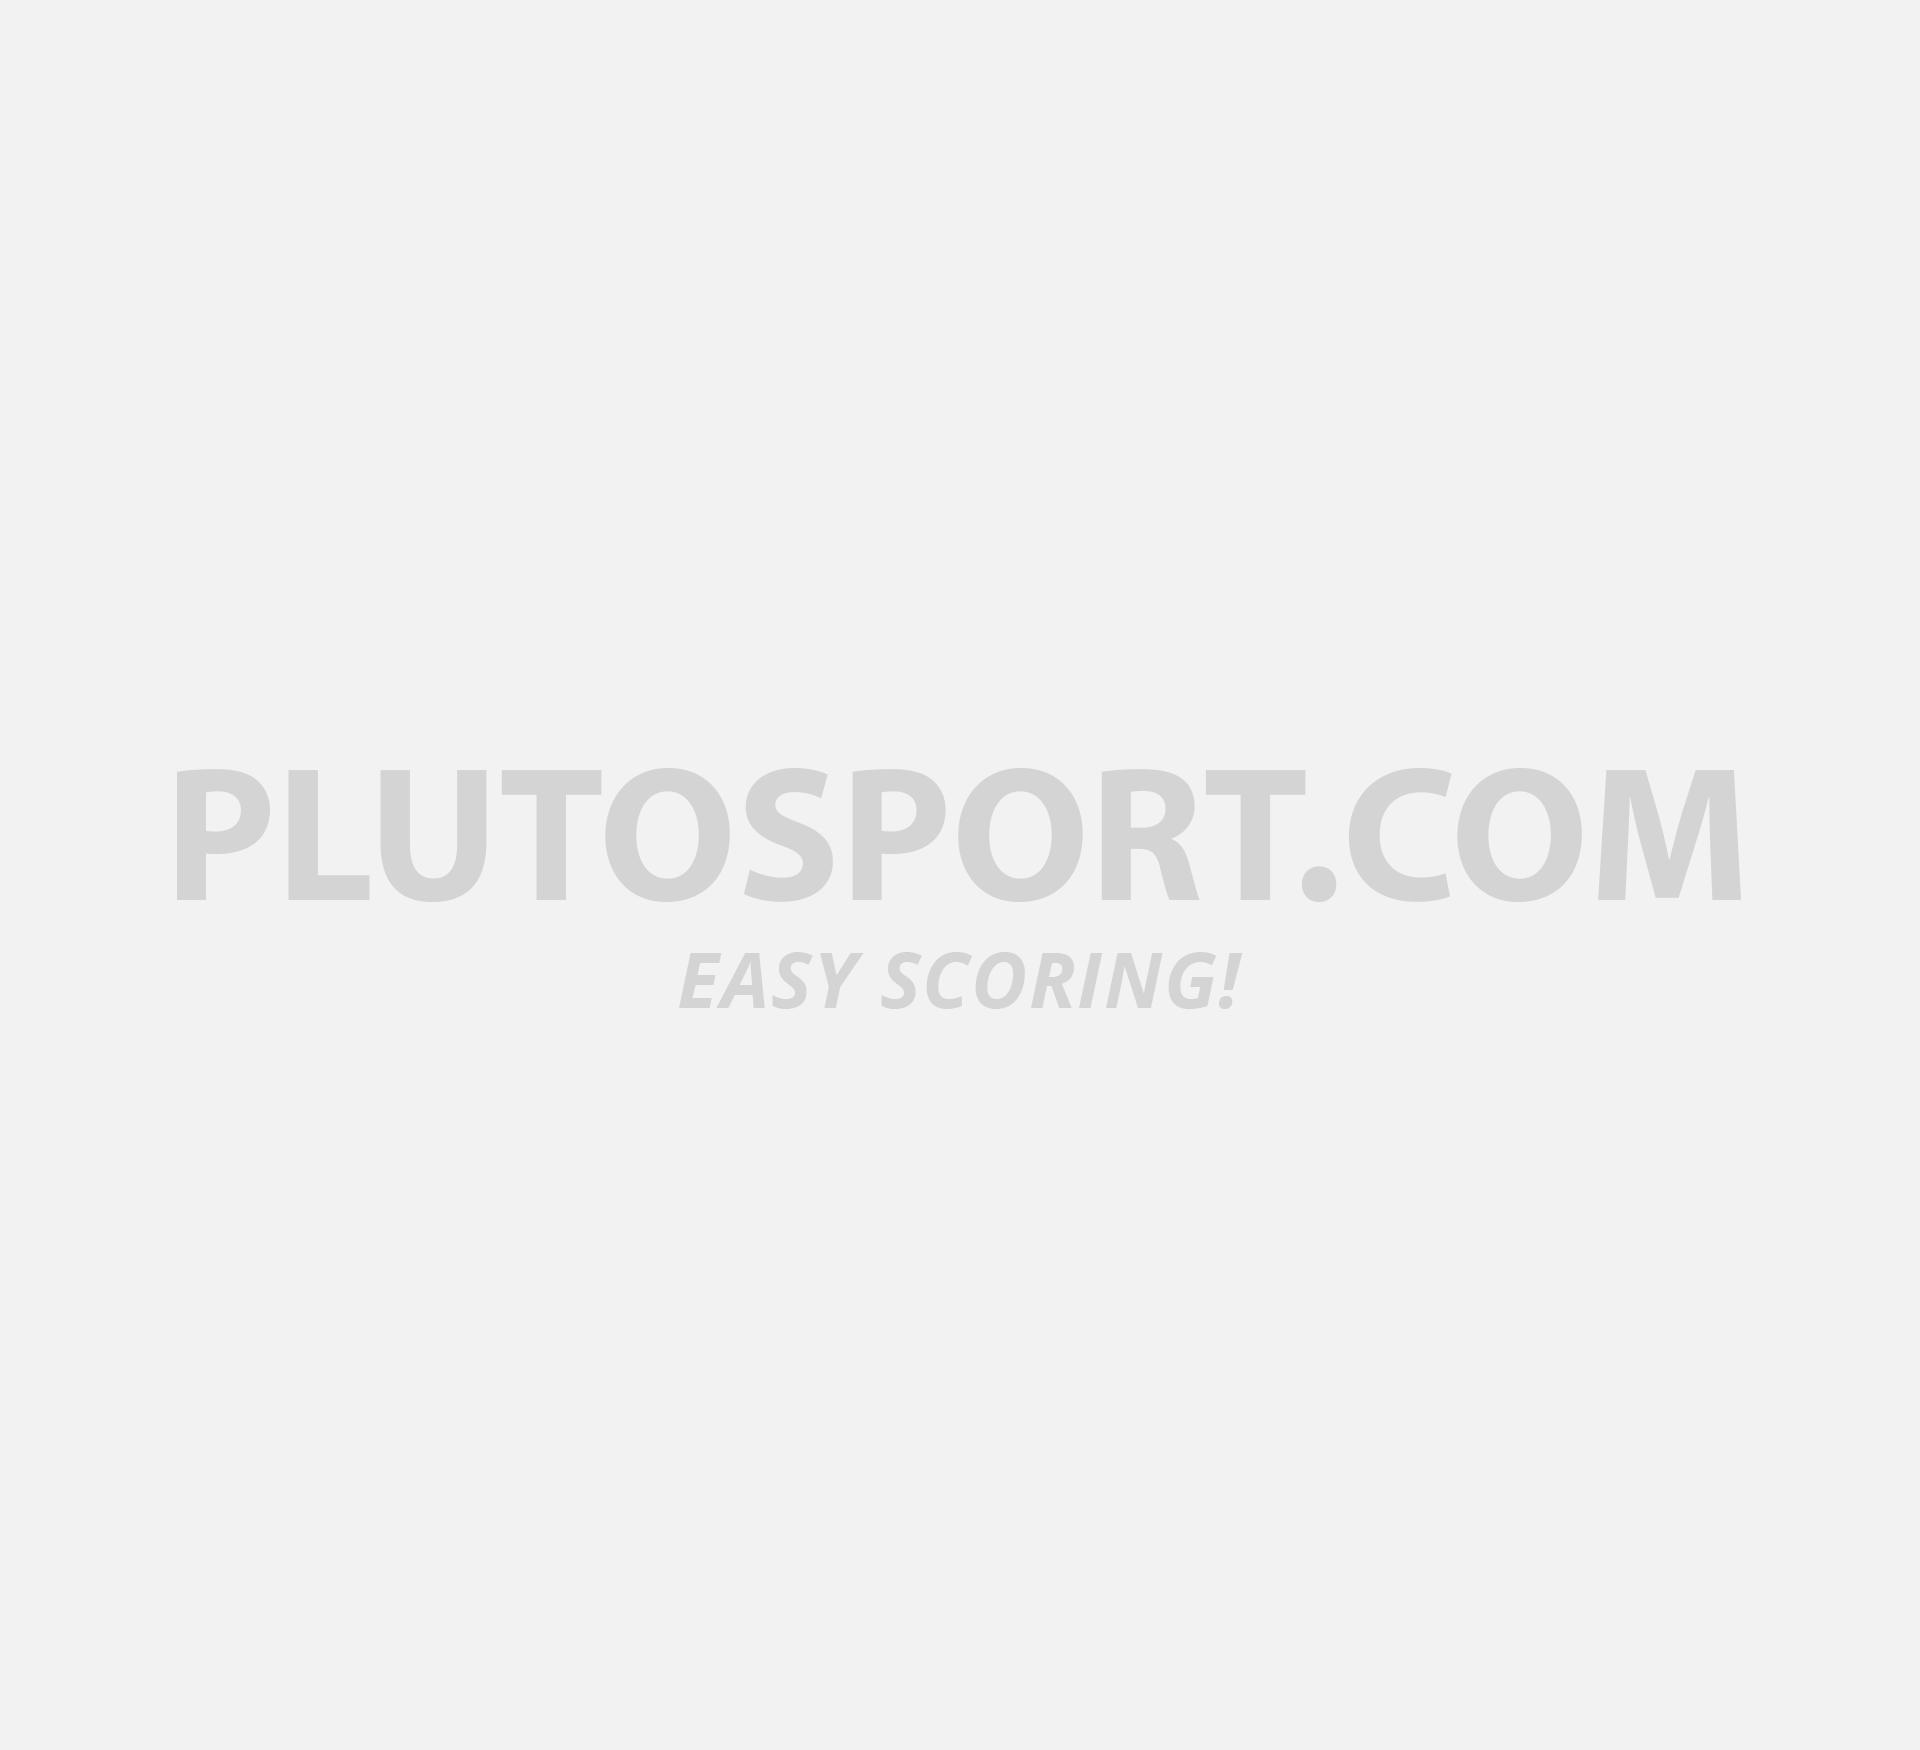 1865c8323923 Aqua Sphere Pool Shoes - Aquashoes - Shoes - Watersport - Sports ...